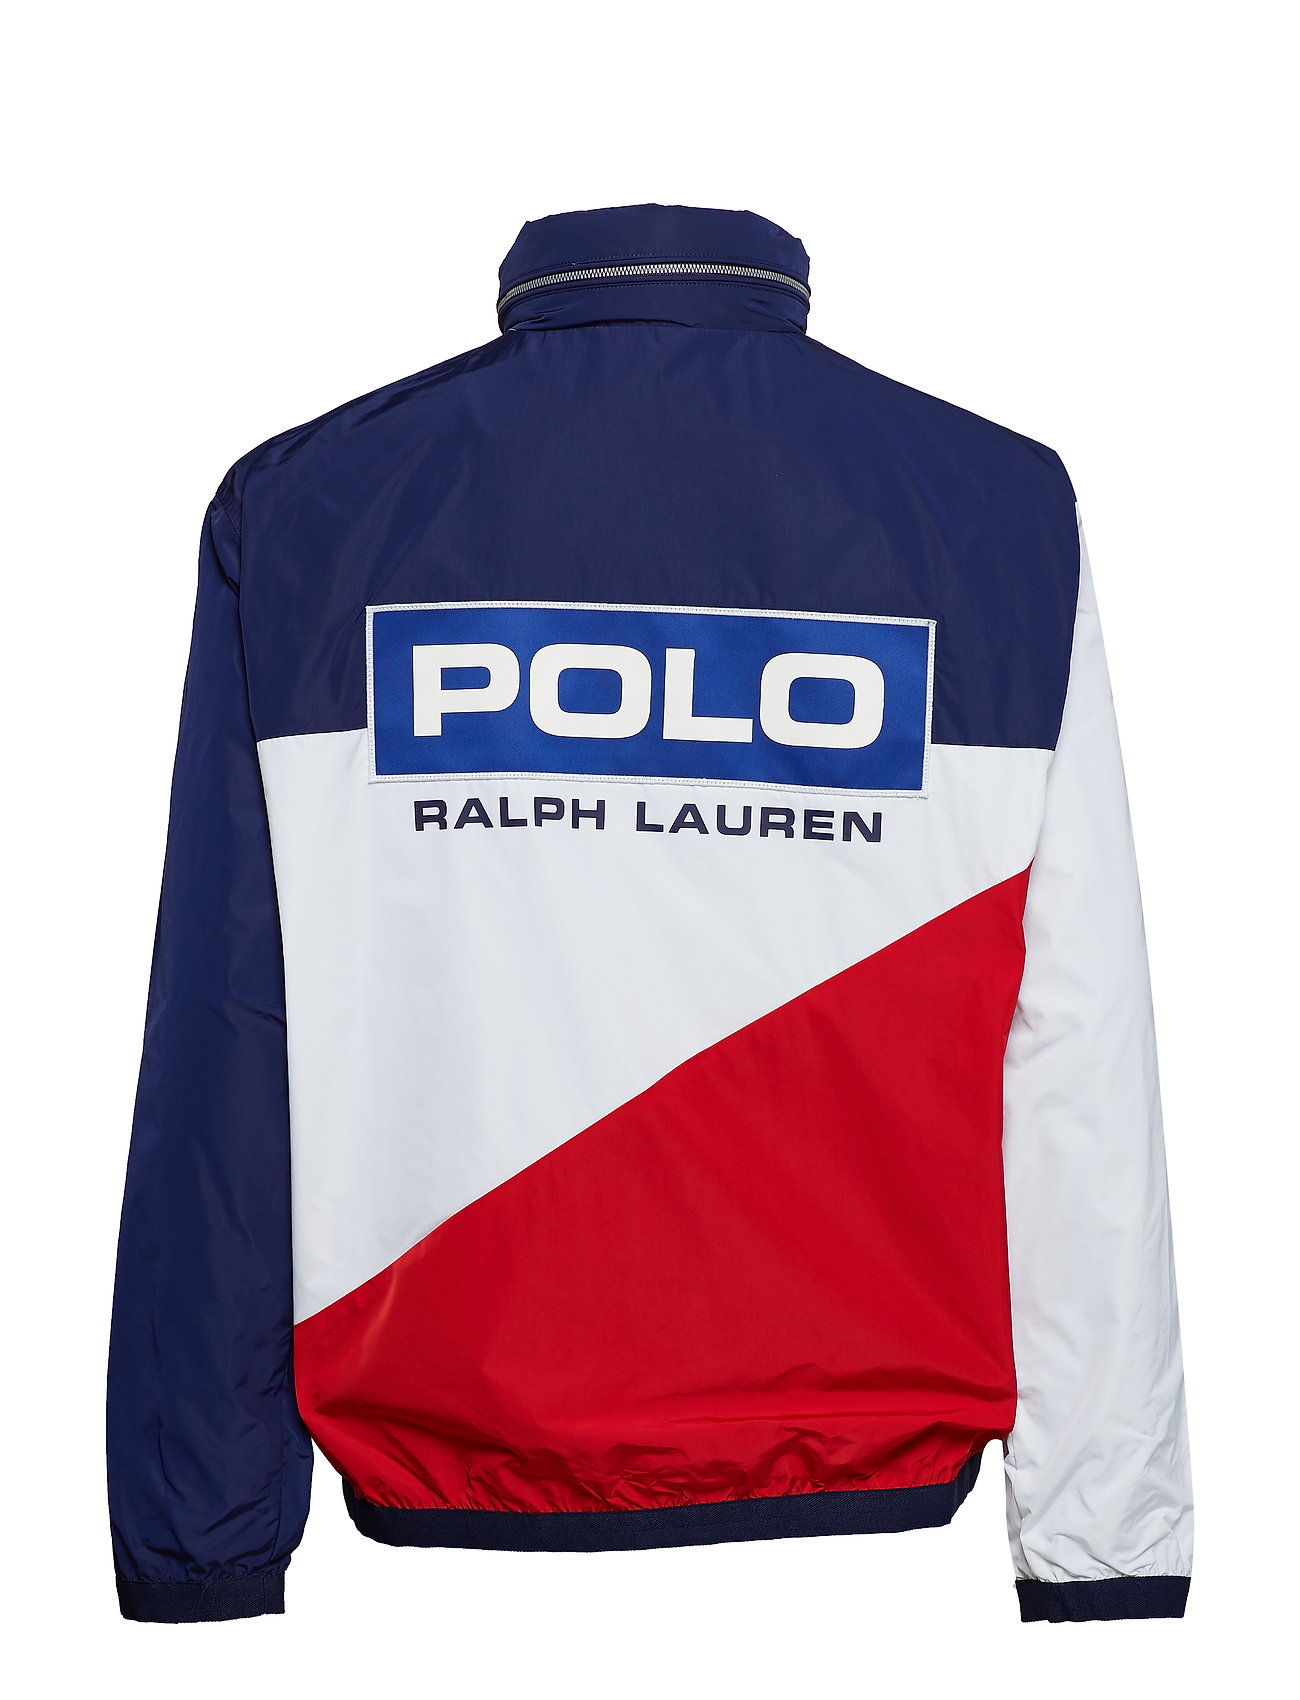 Water repellent Wht Lauren rl2000 Jacketpure Ralph RPolo W2IEDH9